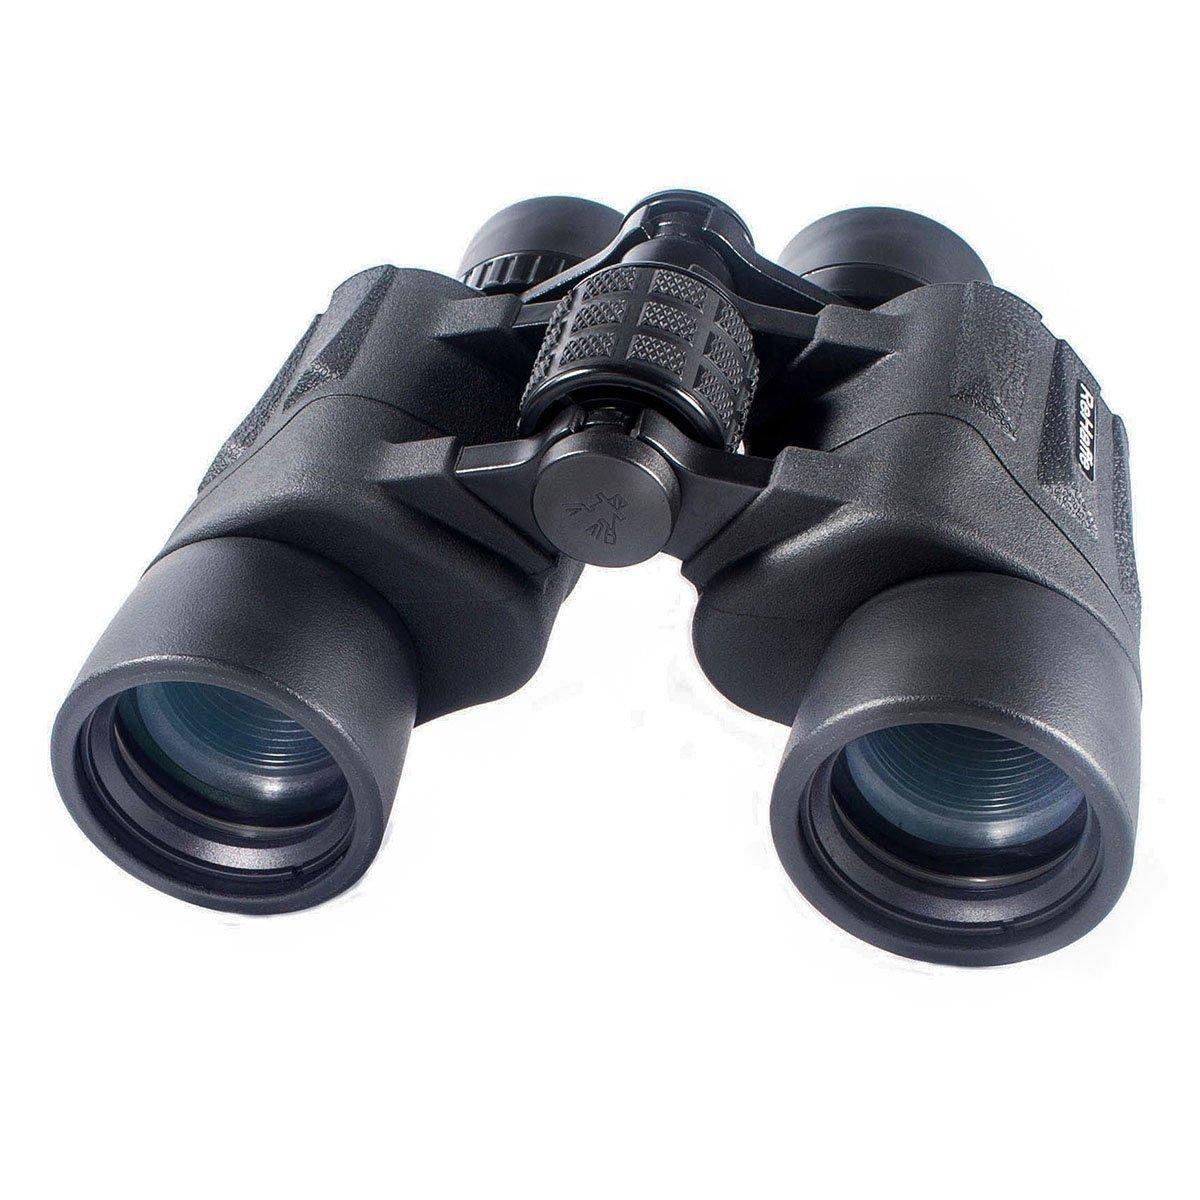 rehaffe防水Fogproof Porroプリズム双眼Professional 8 x 40 long eye relief for Travel B071X1SHT4